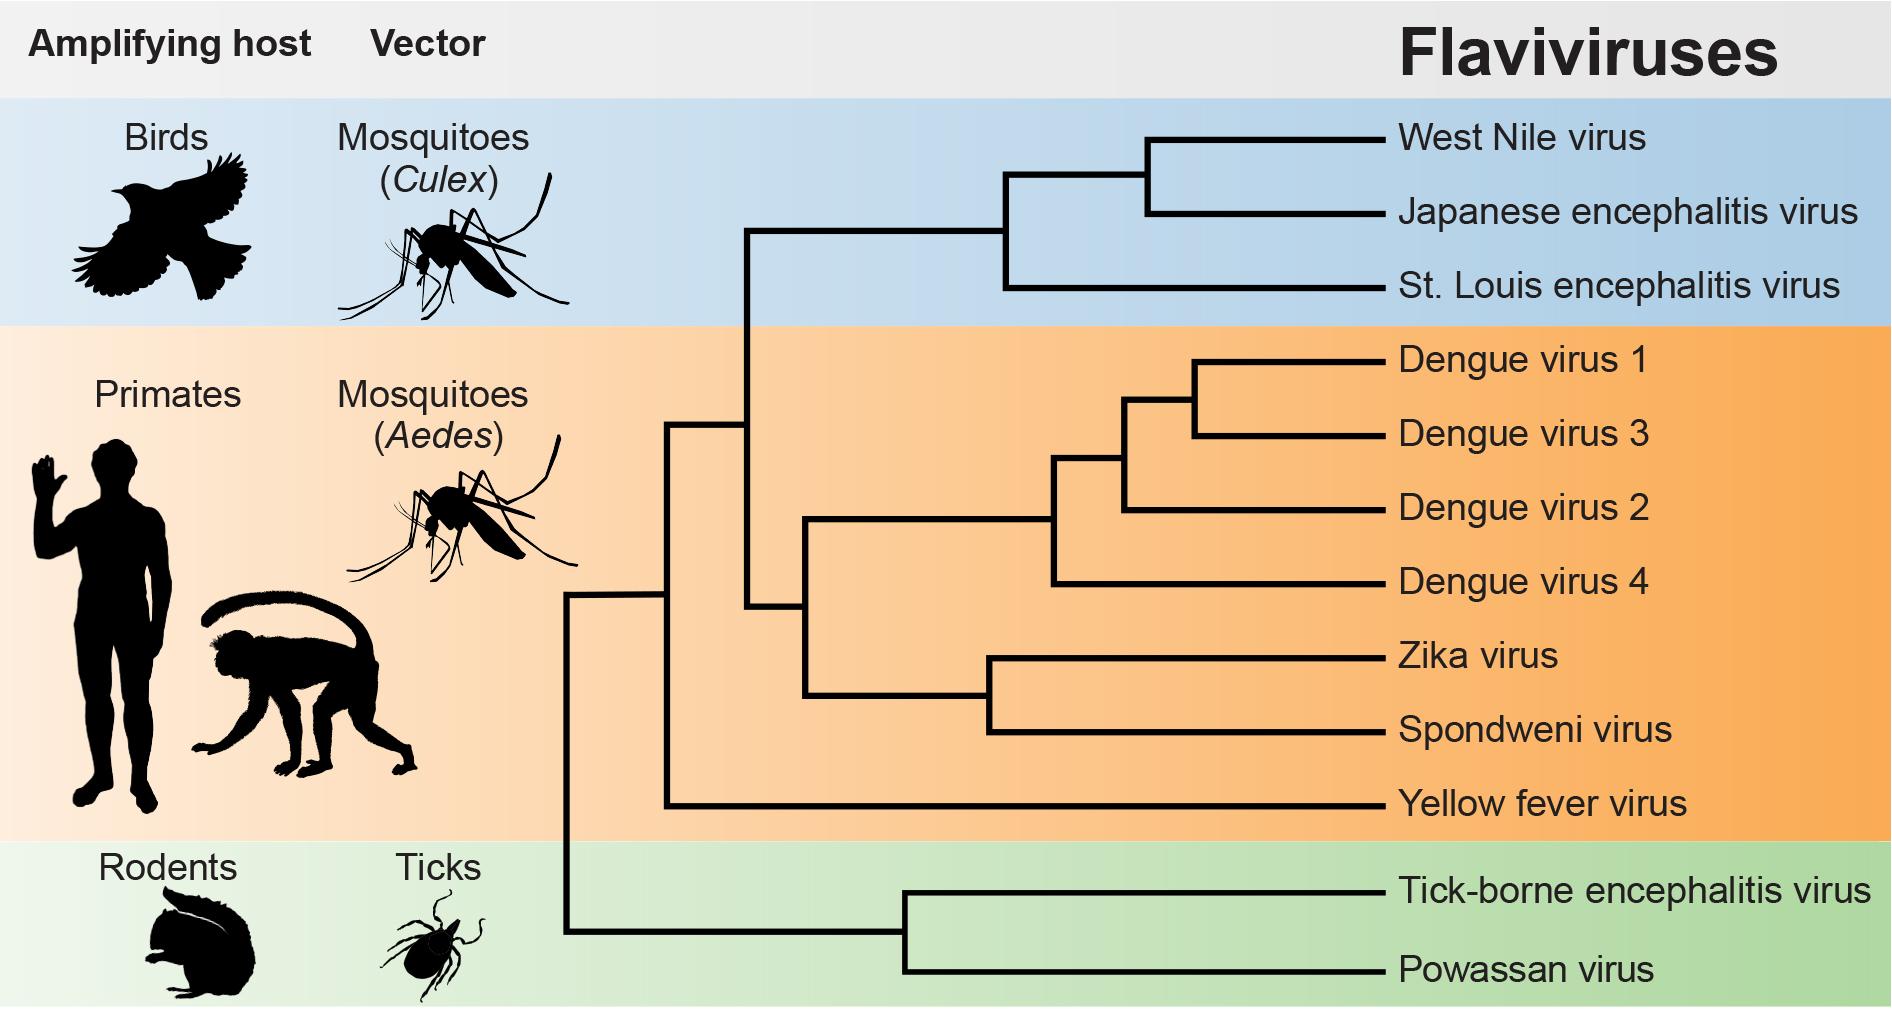 Examples of flaviviruses that cause human disease